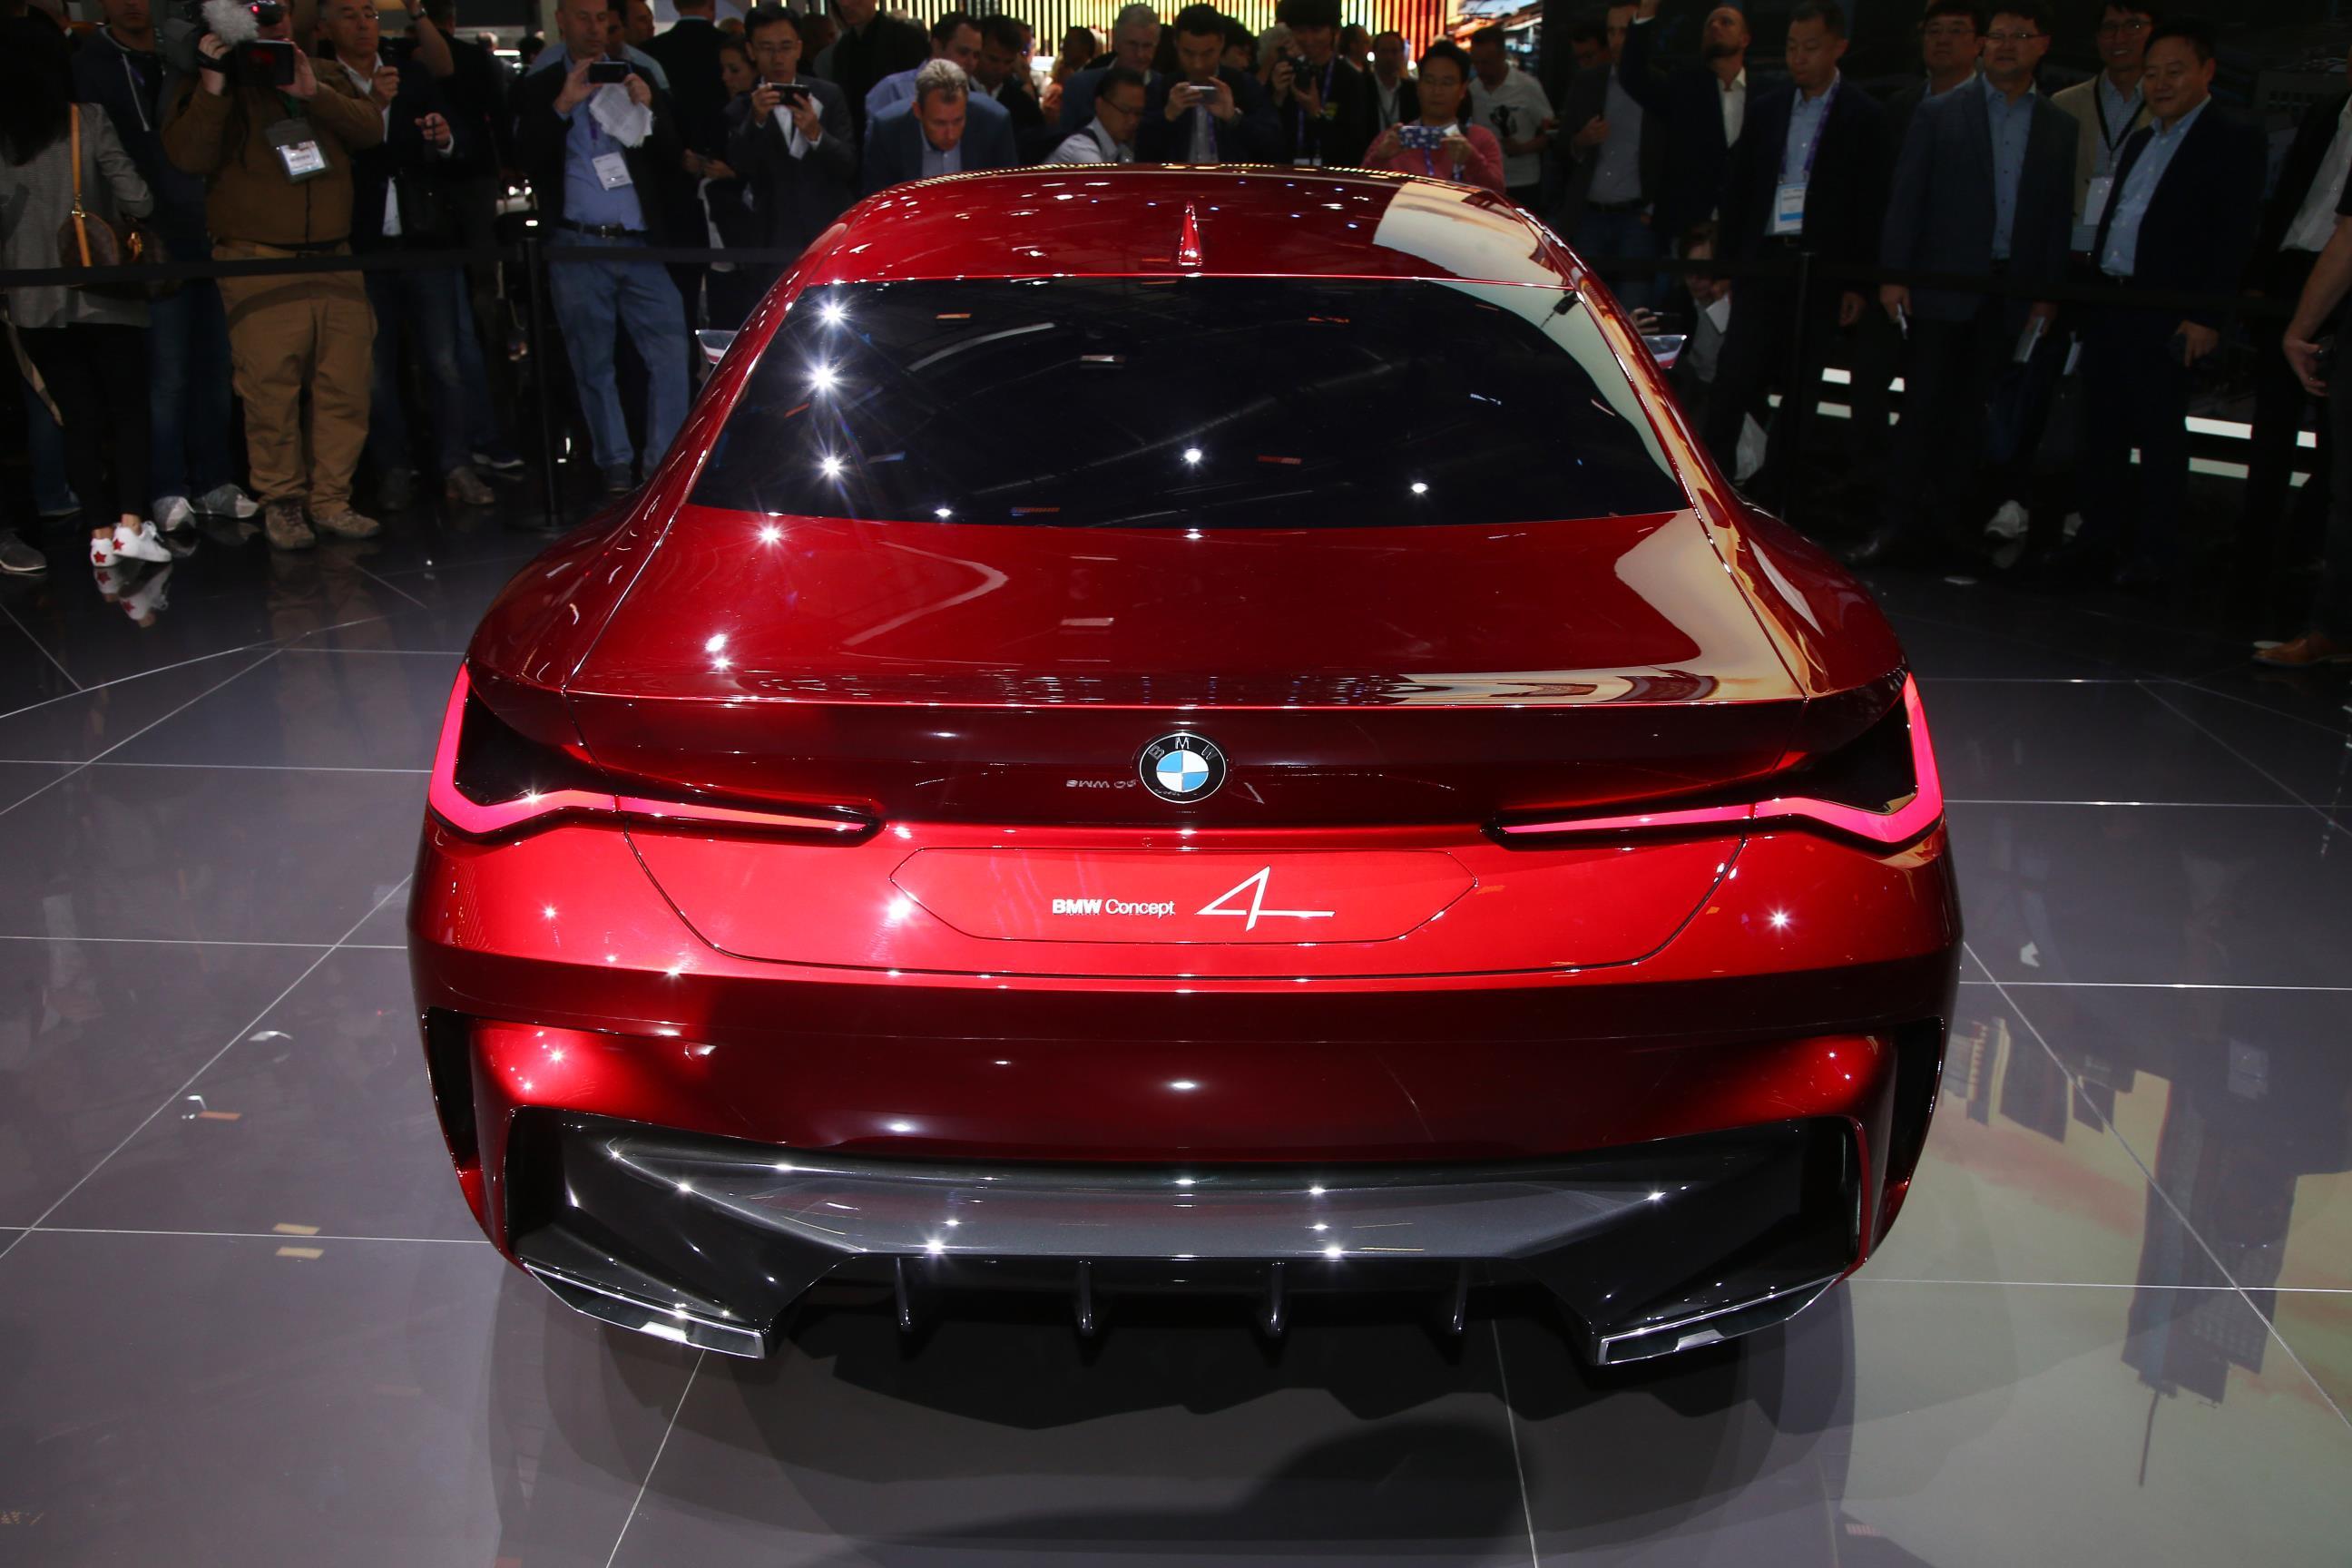 BMW Concept 4 Rear Lights